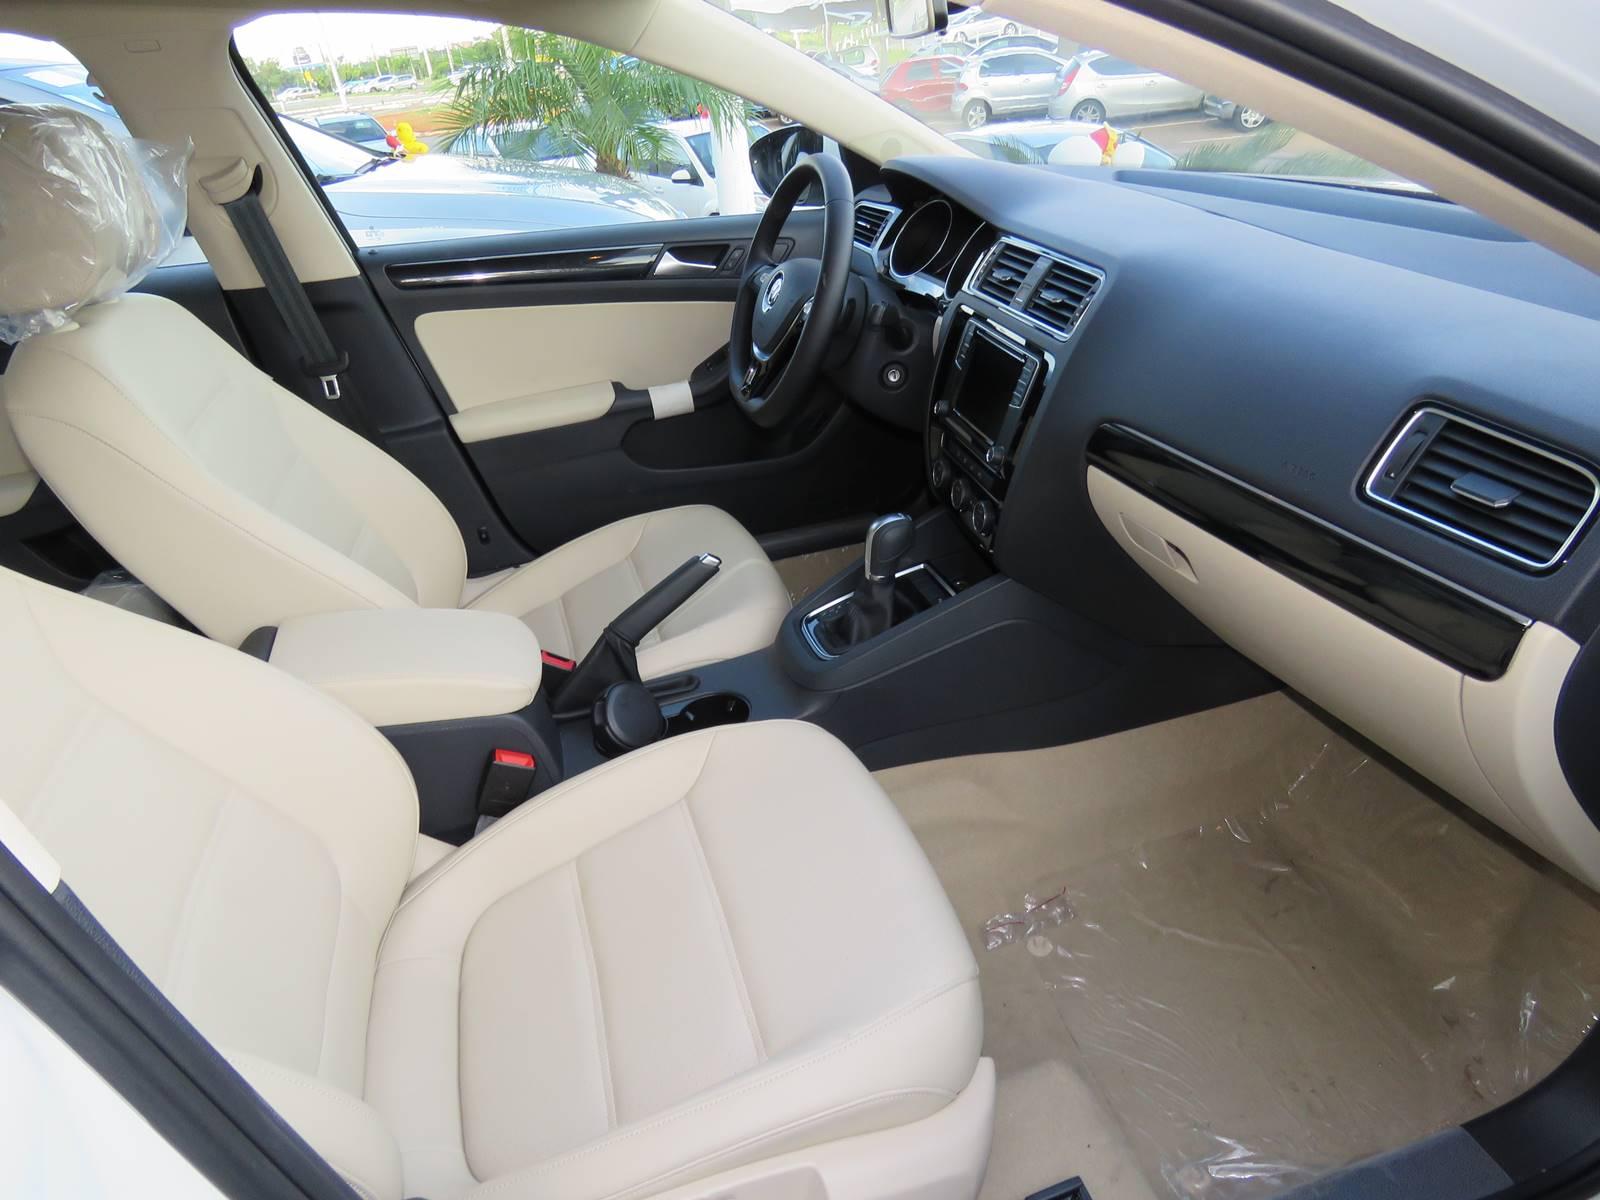 VW Jetta 2016 Comfortline 1.4 TSI - interior